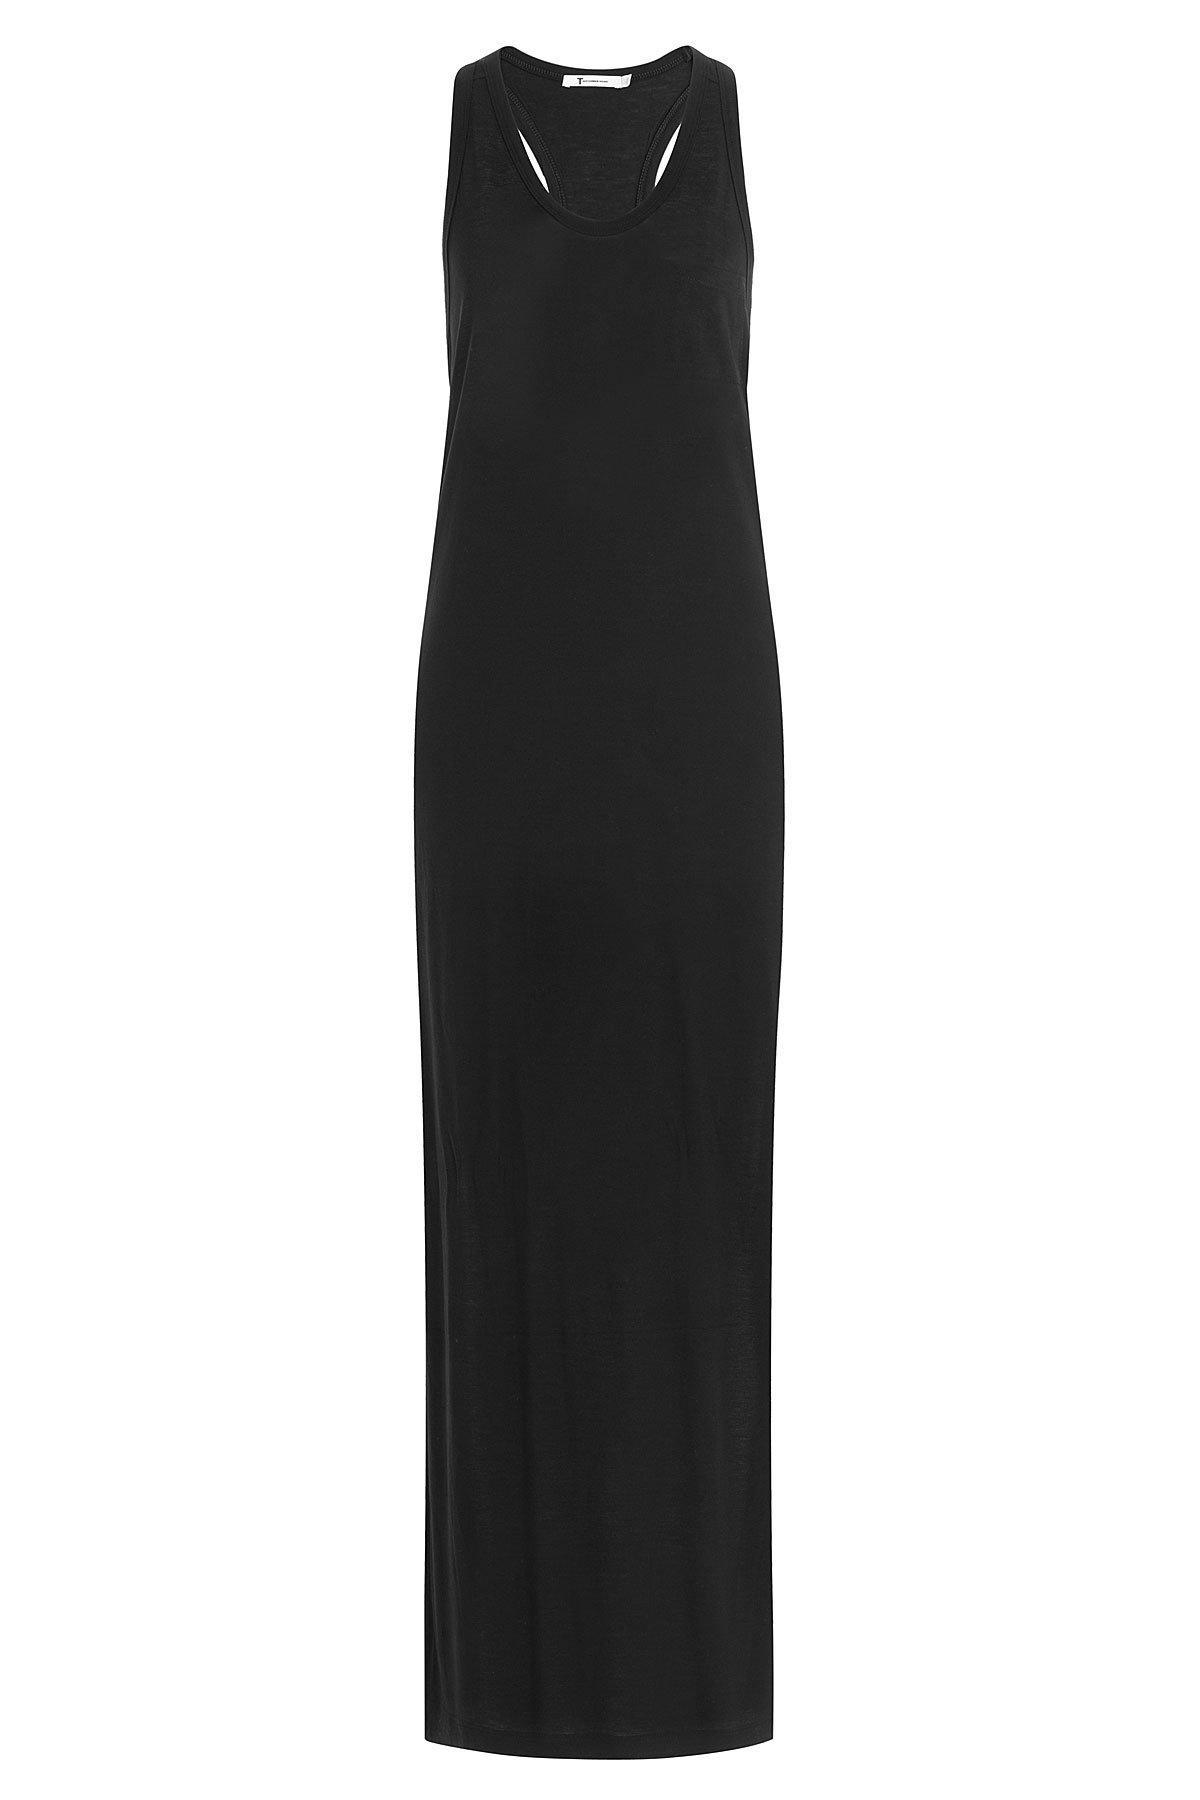 Fashionable For Sale Discount Latest DRESSES - Short dresses Etienne Deroeux Outlet New MlRwMB0